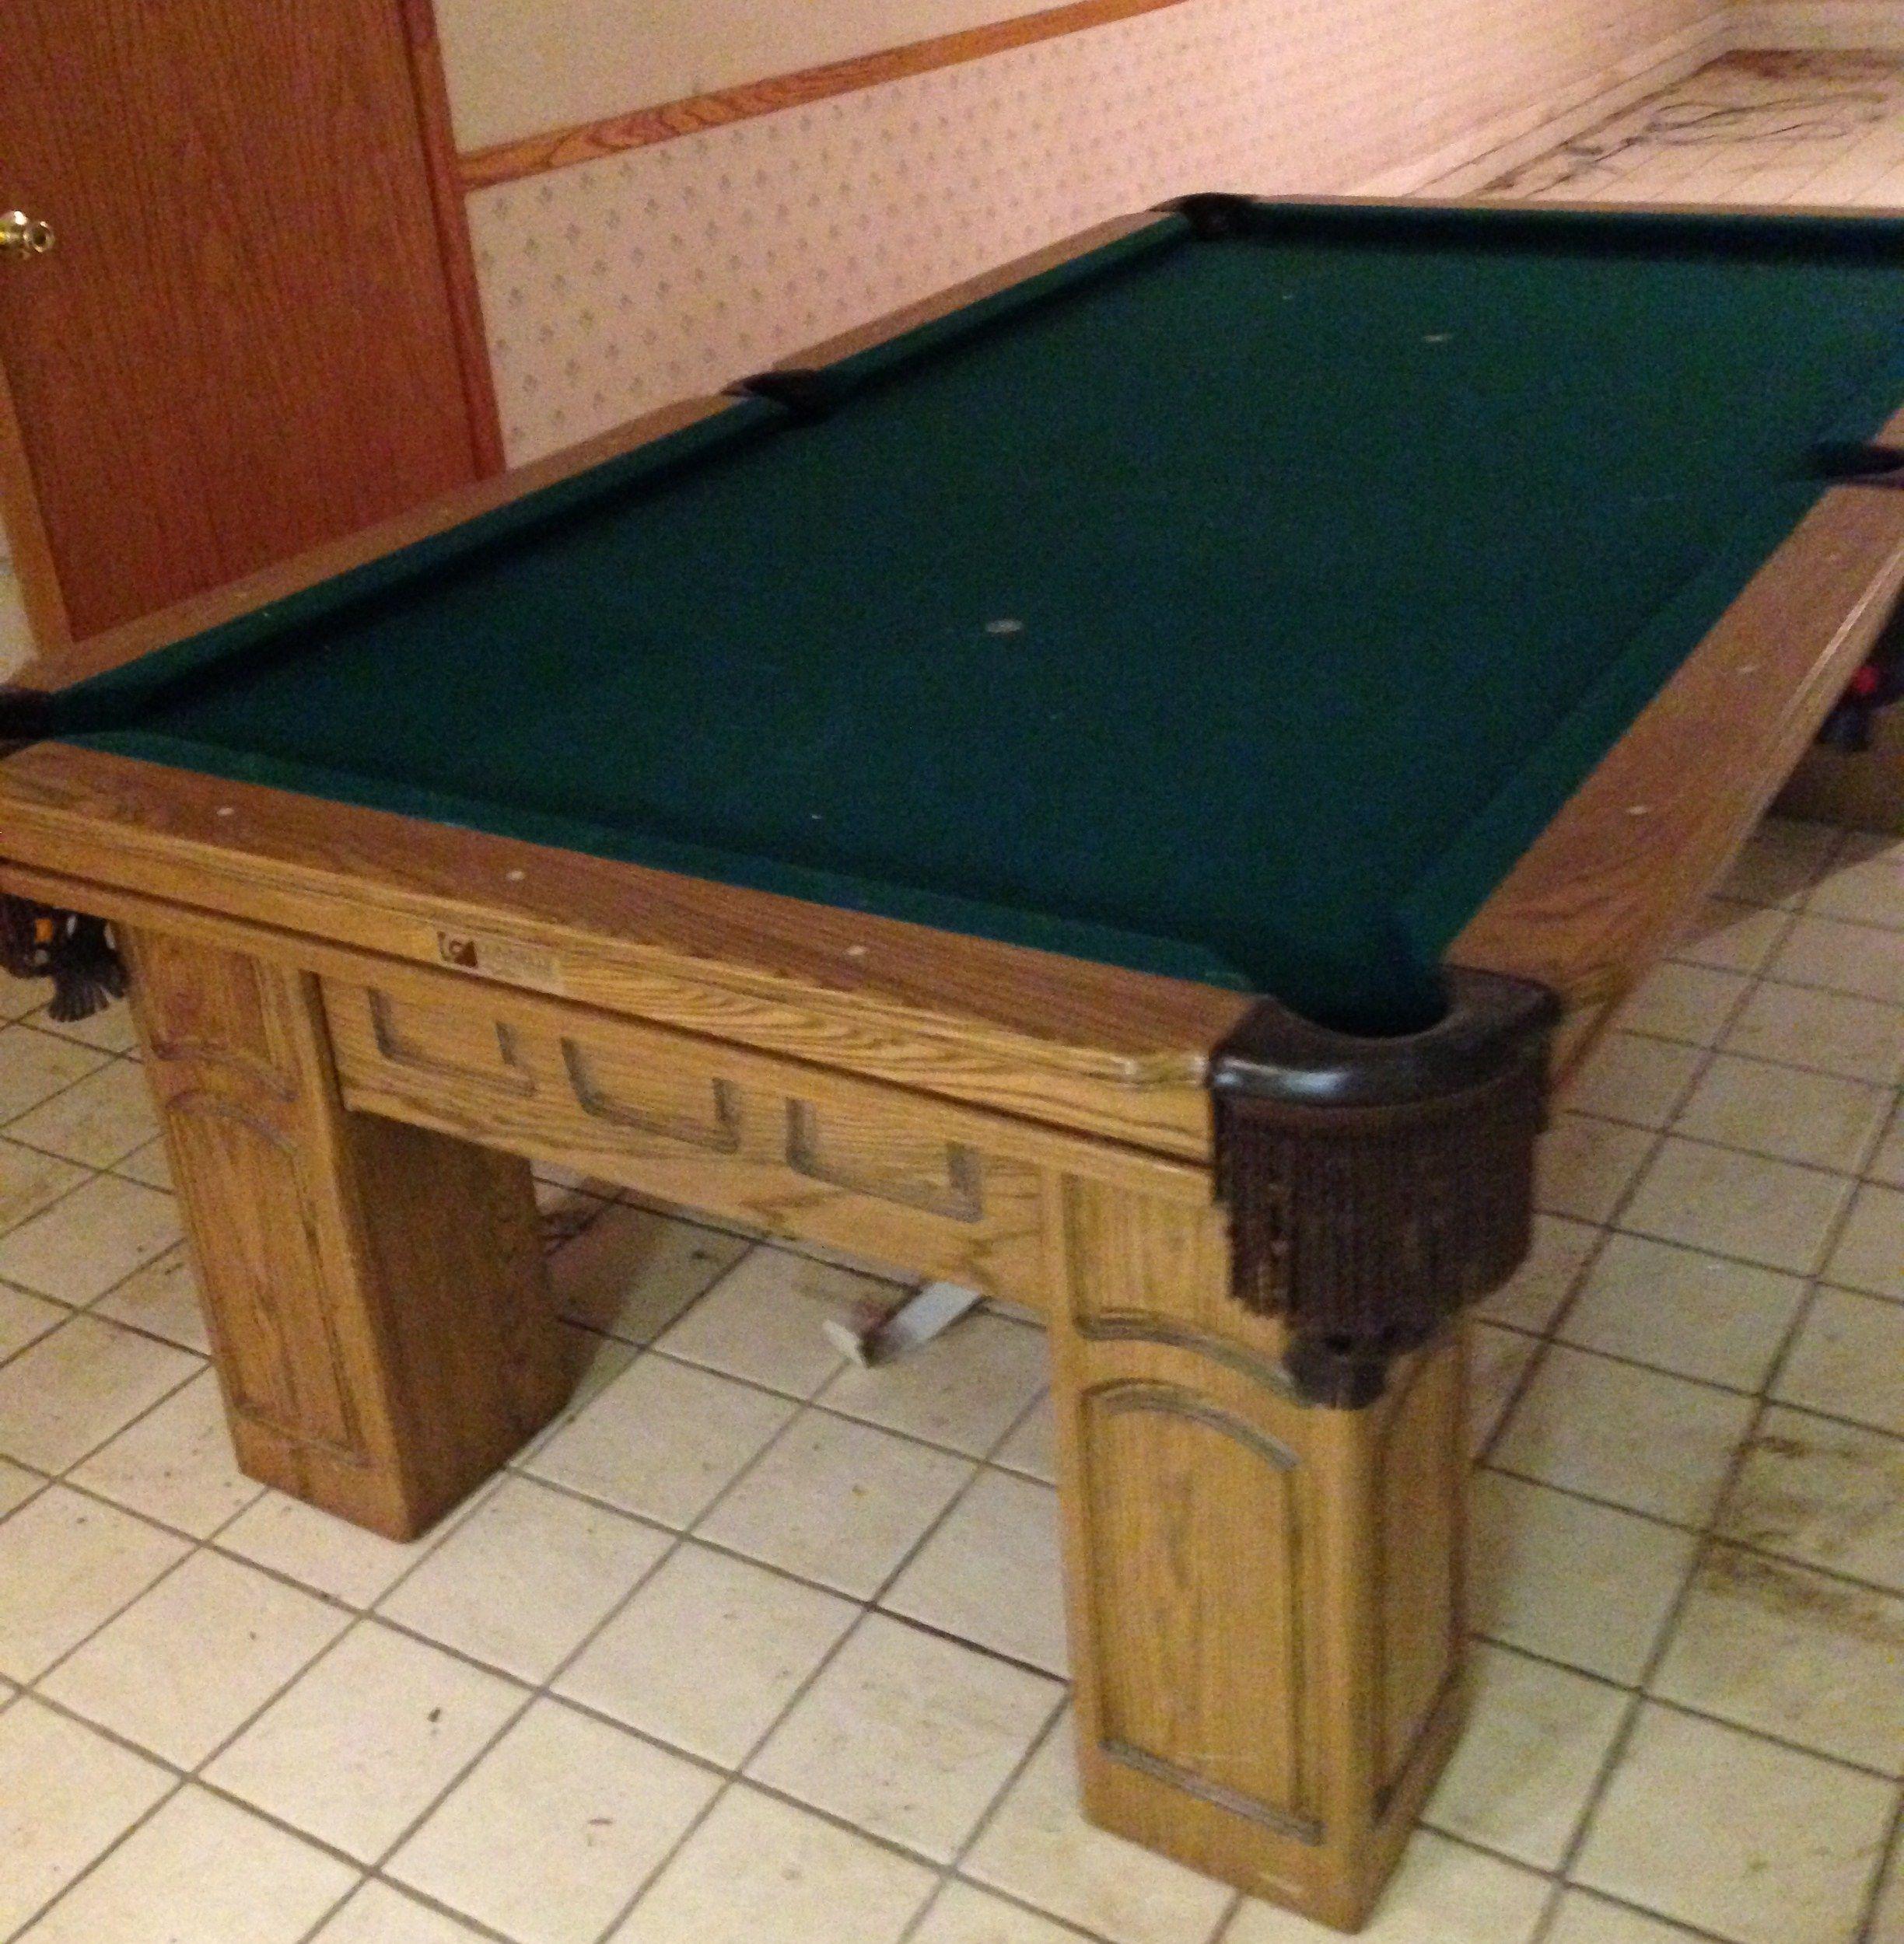 Billiards Pool Table For Sale Solid Wood Genuine Slate